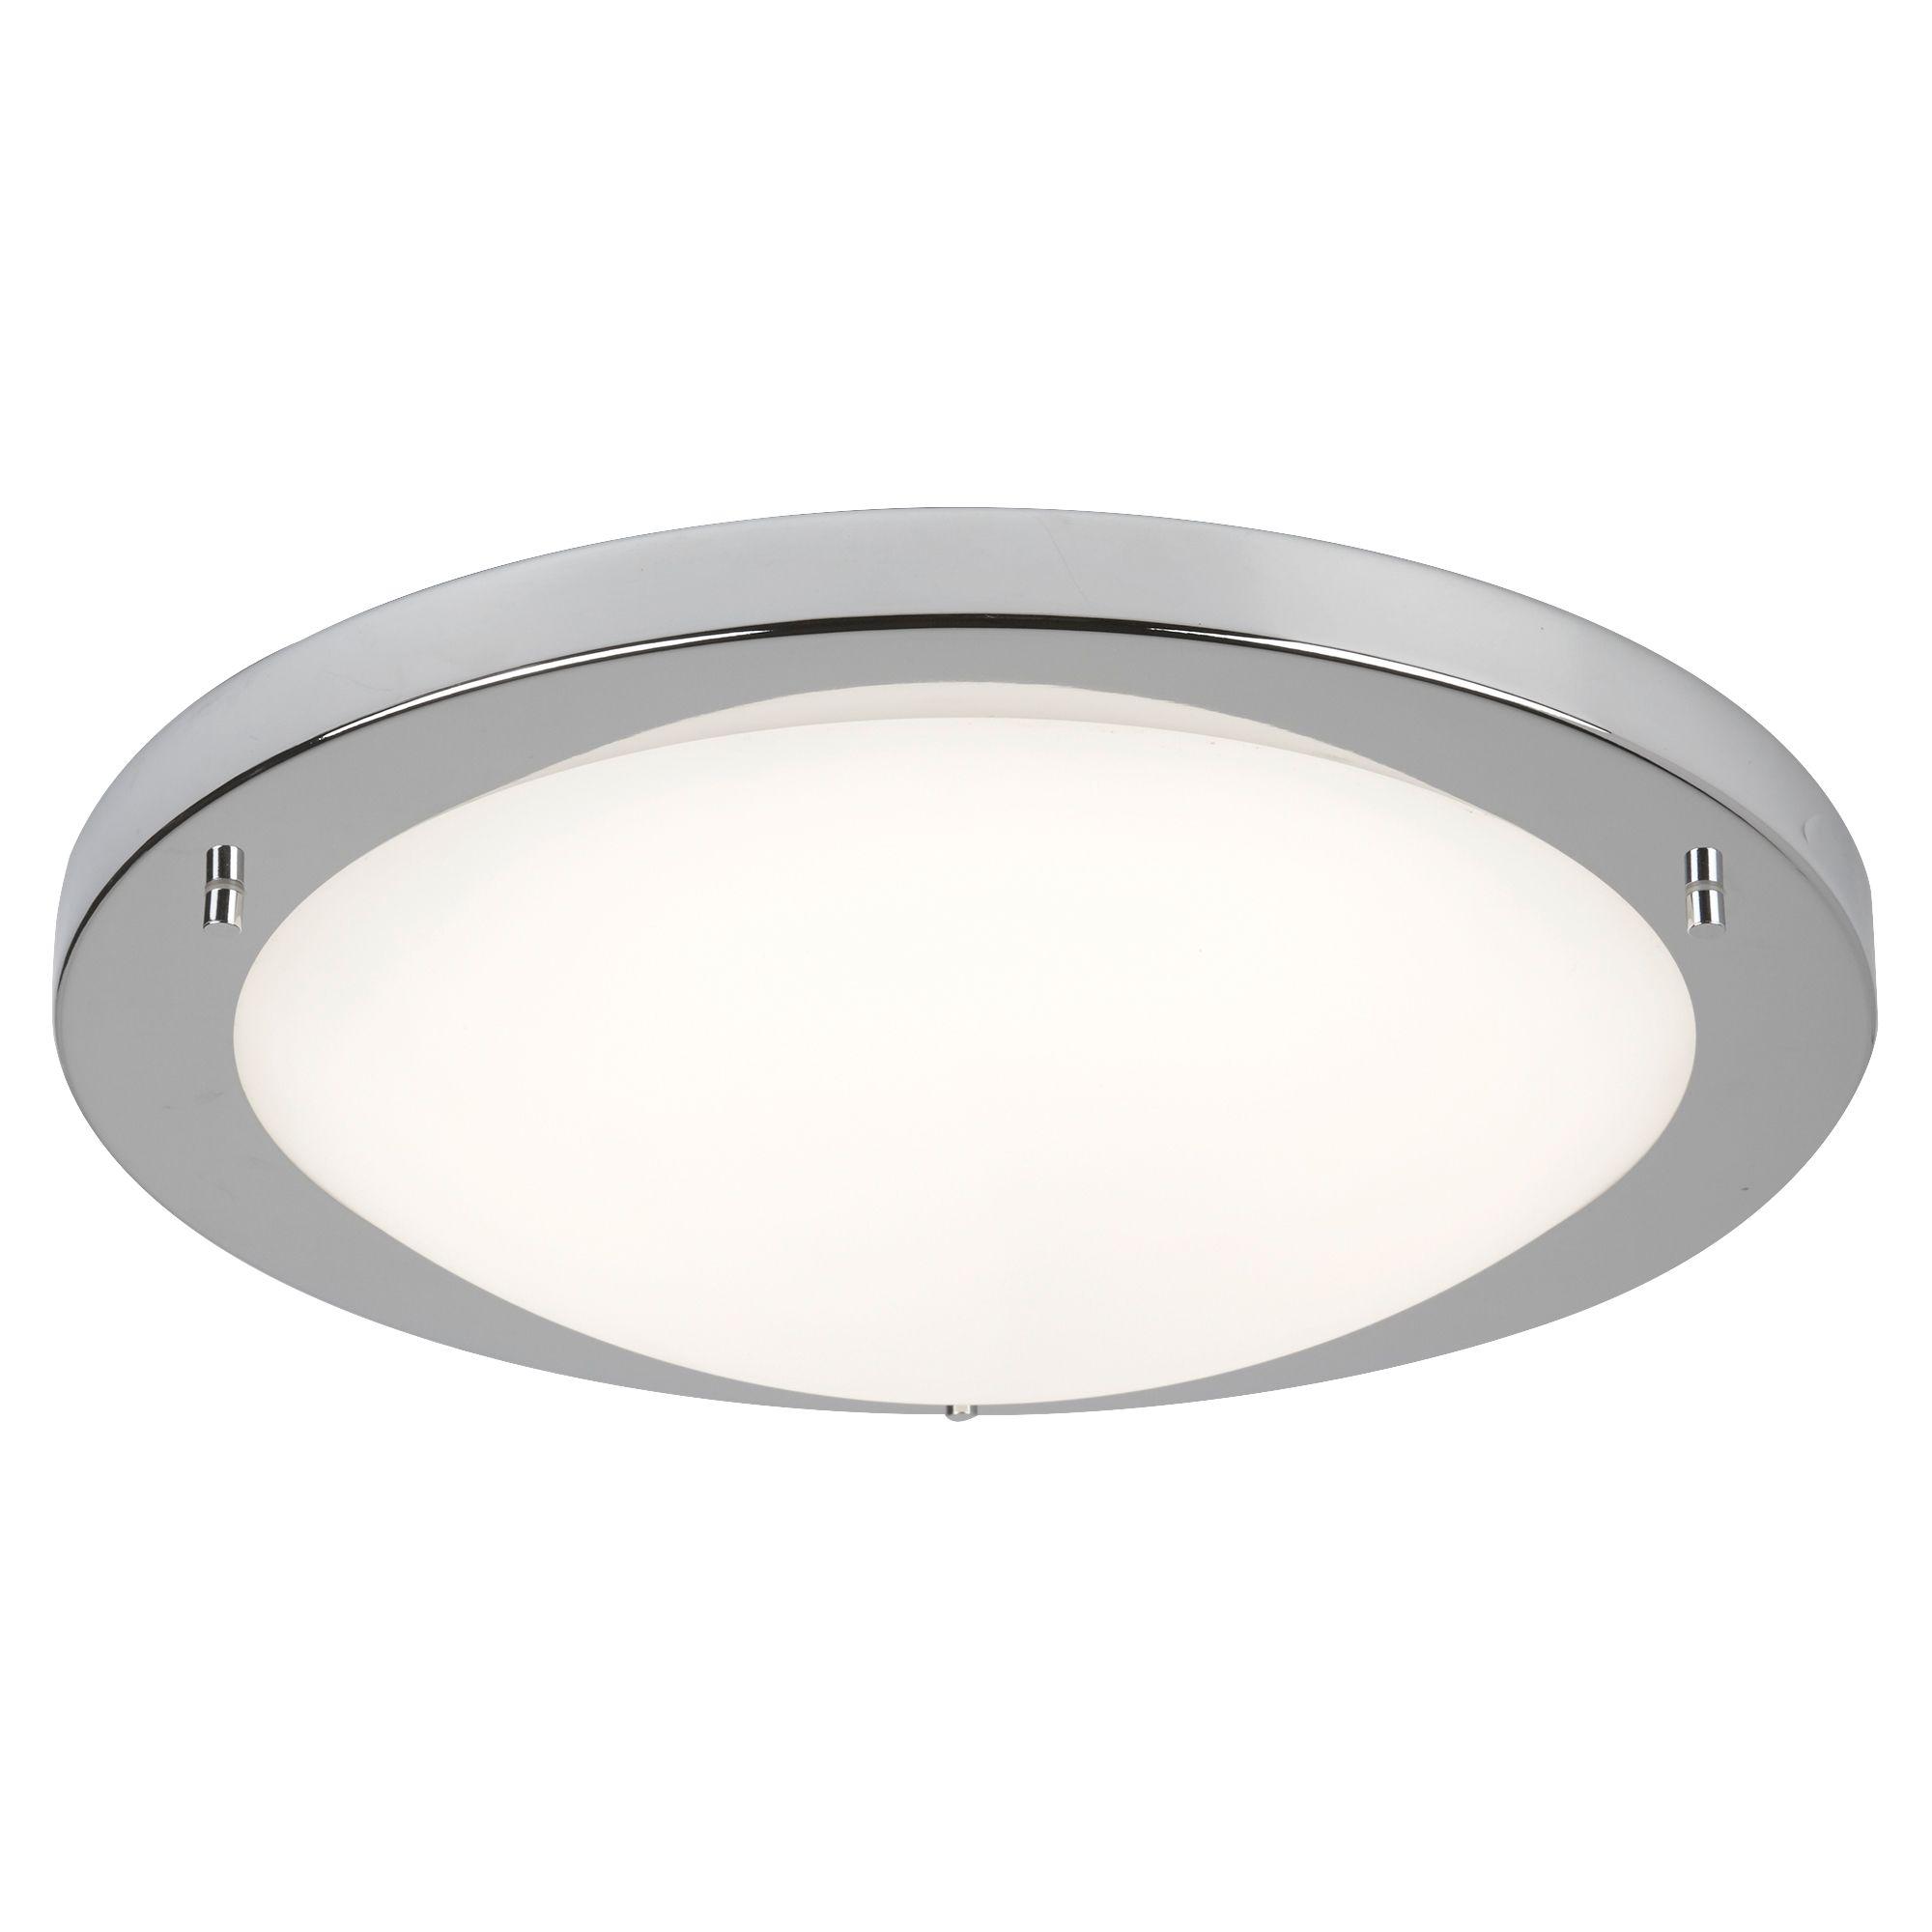 Searchlight LED Flush IP védett